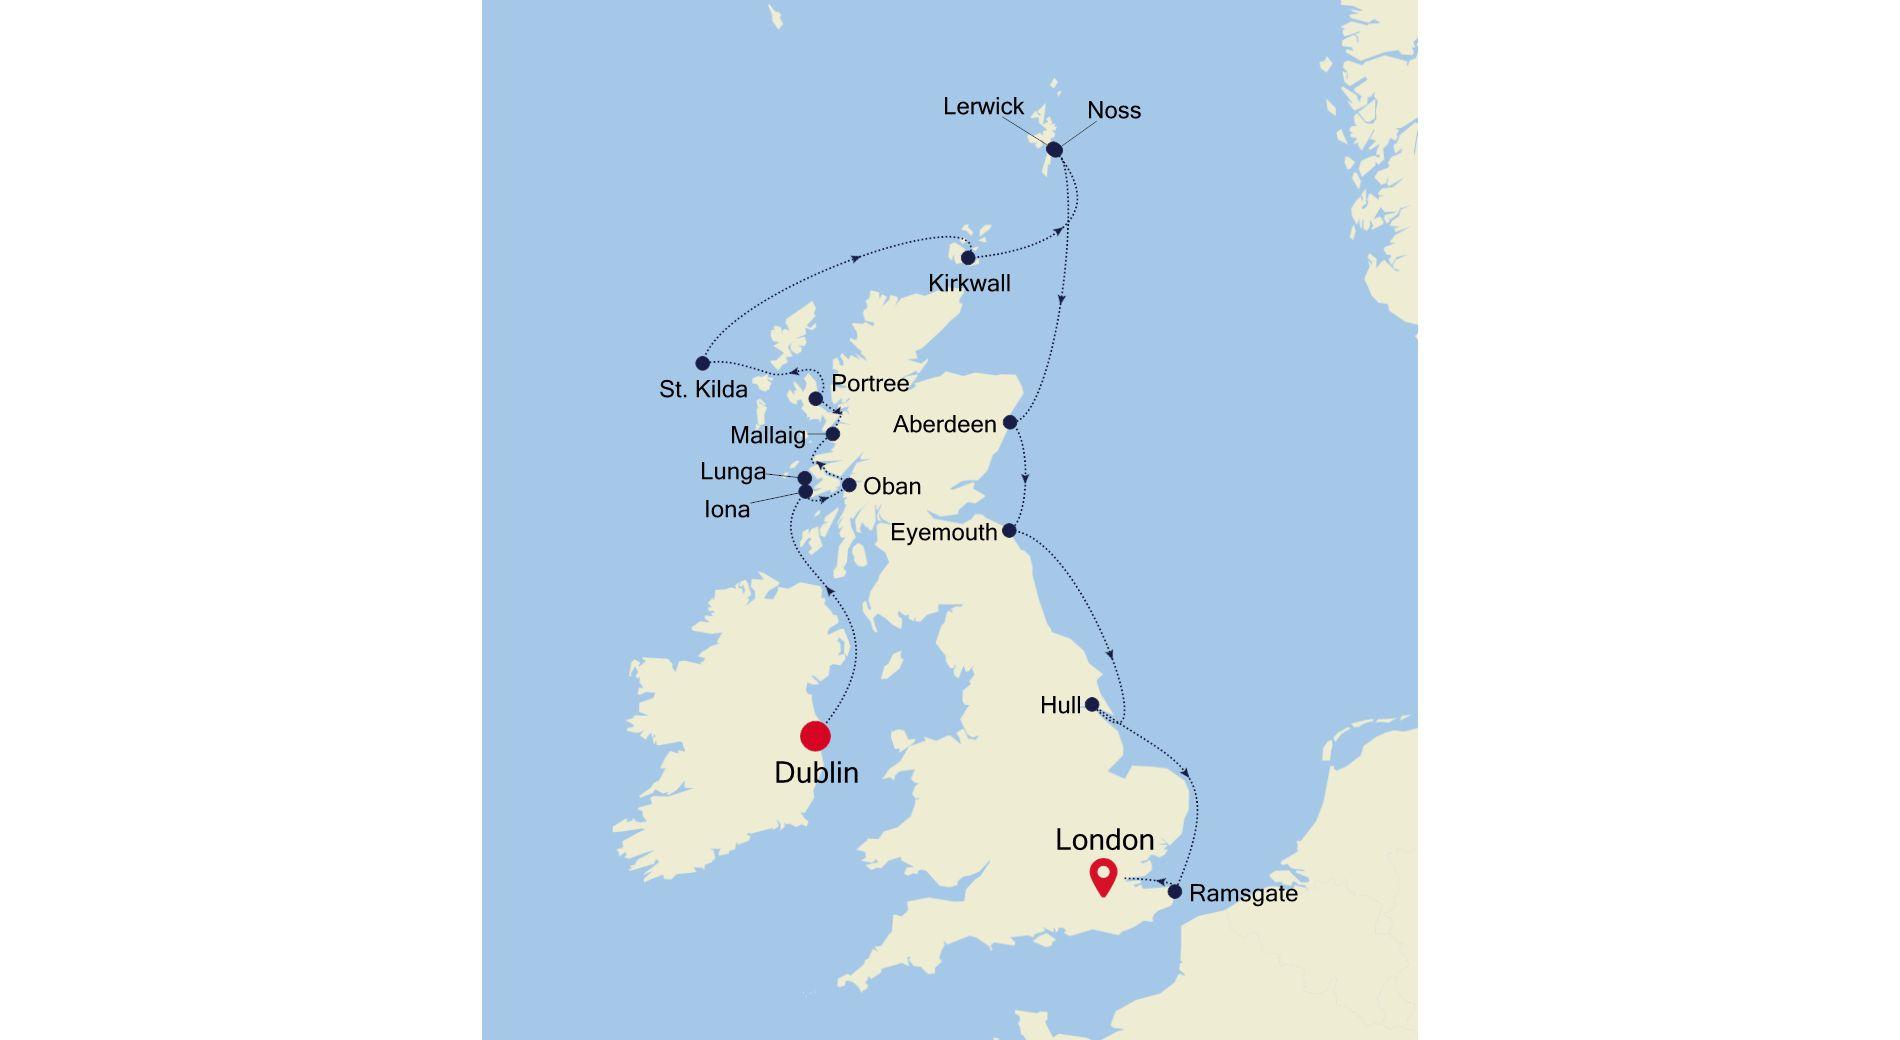 1912 - Dublin nach London